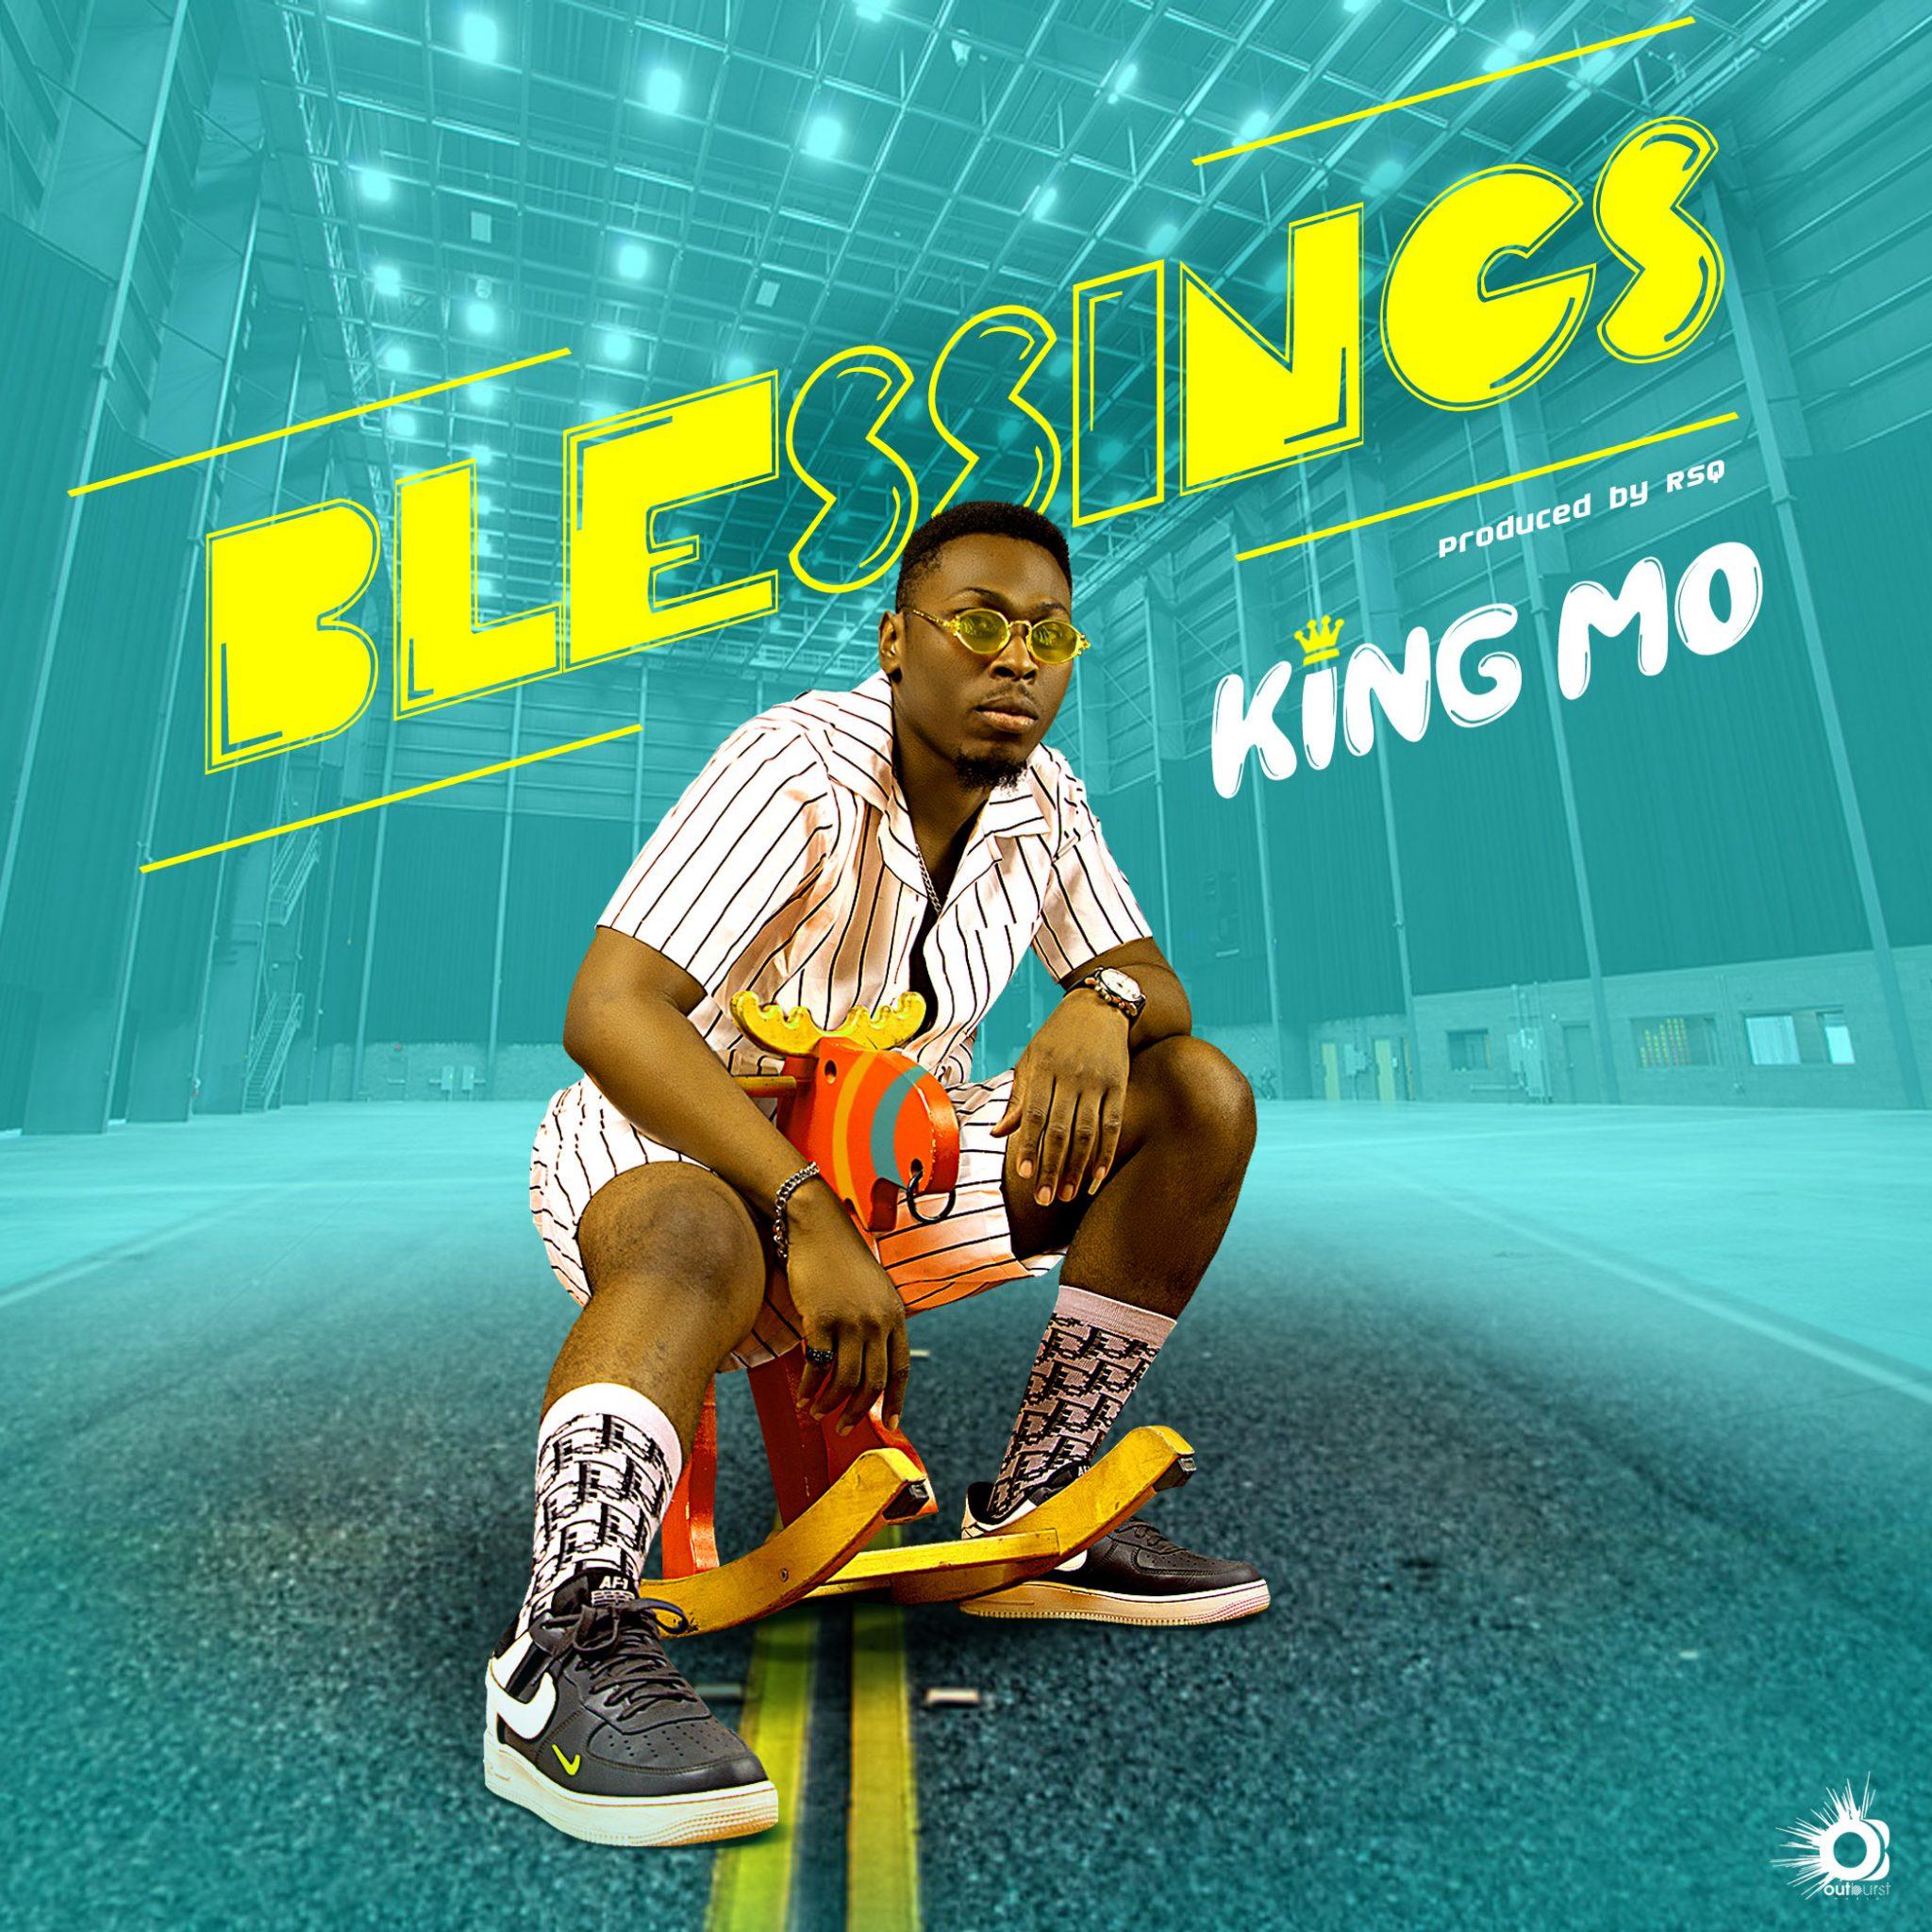 king Mo Blessings